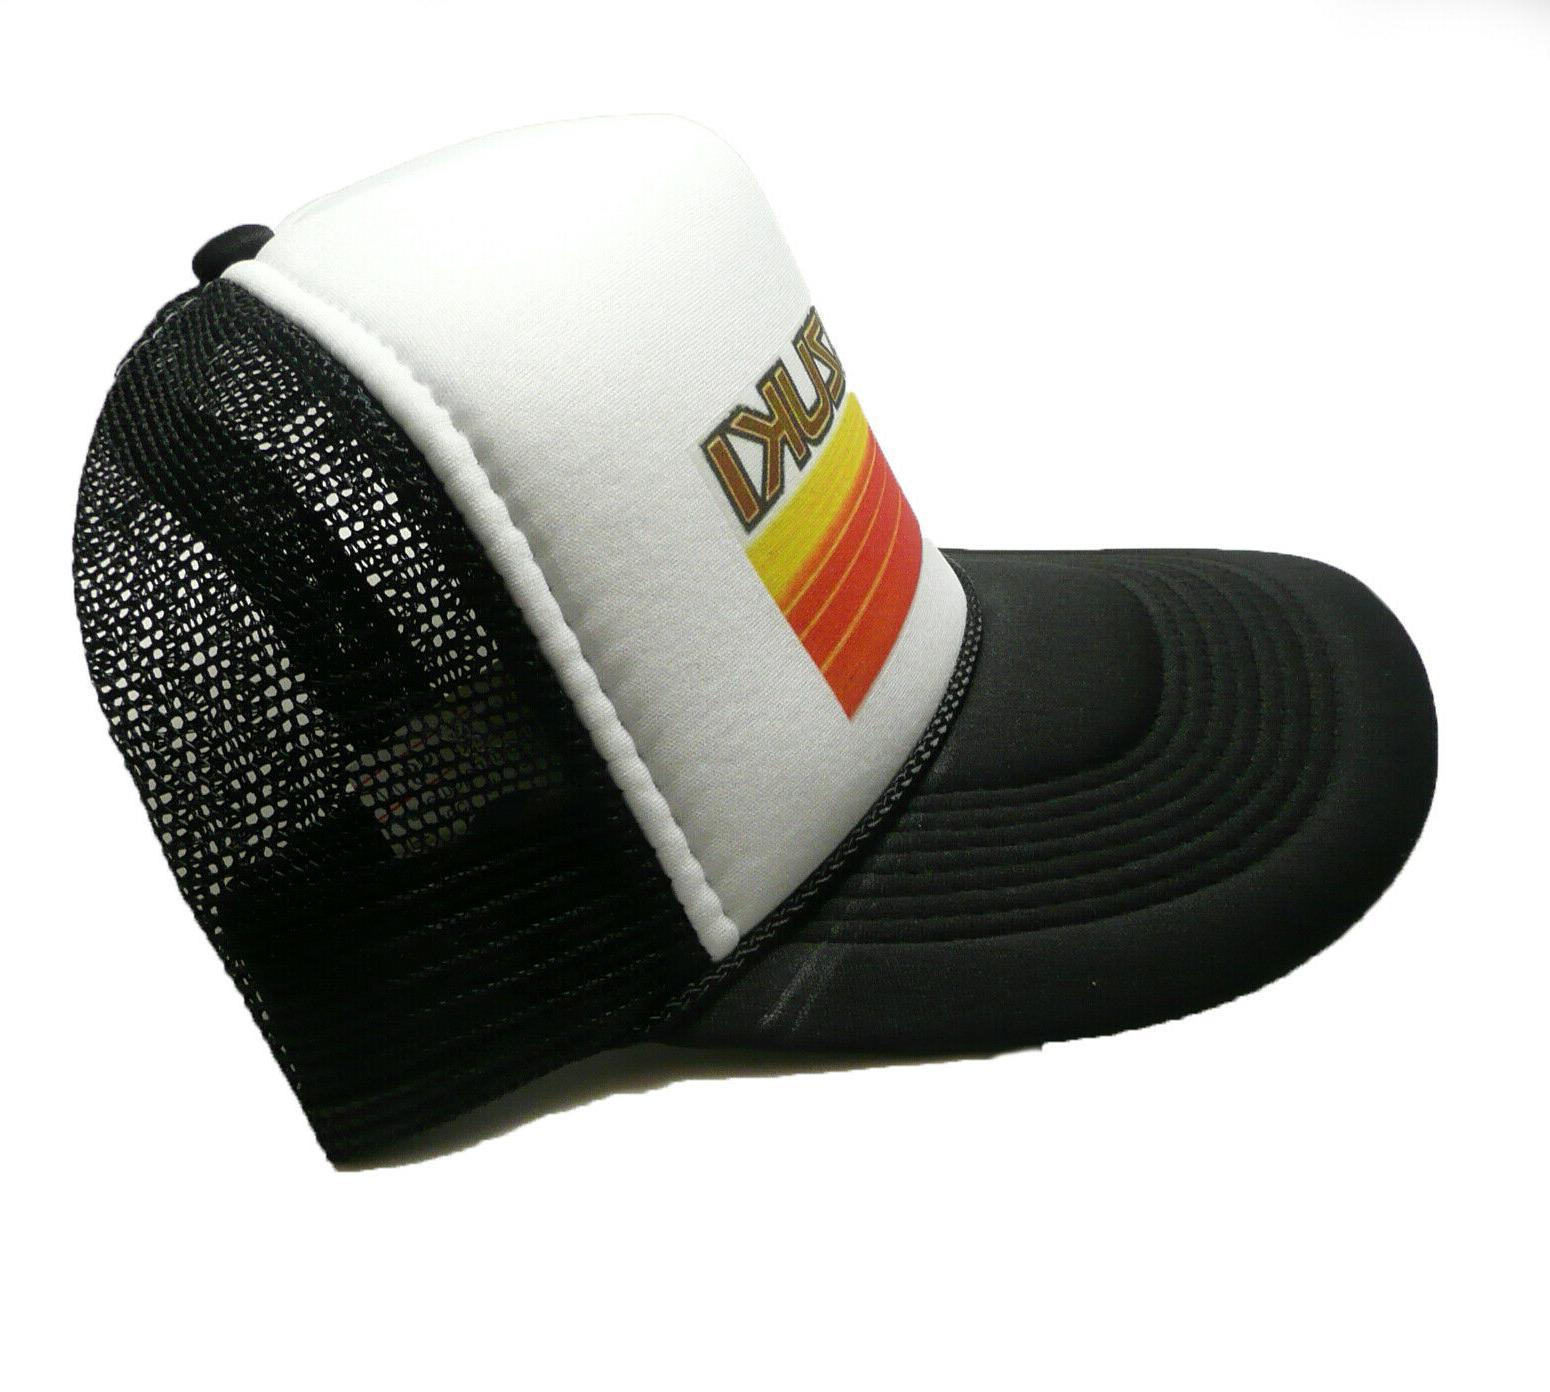 Suzuki trucker hat snap hat new black motocross new